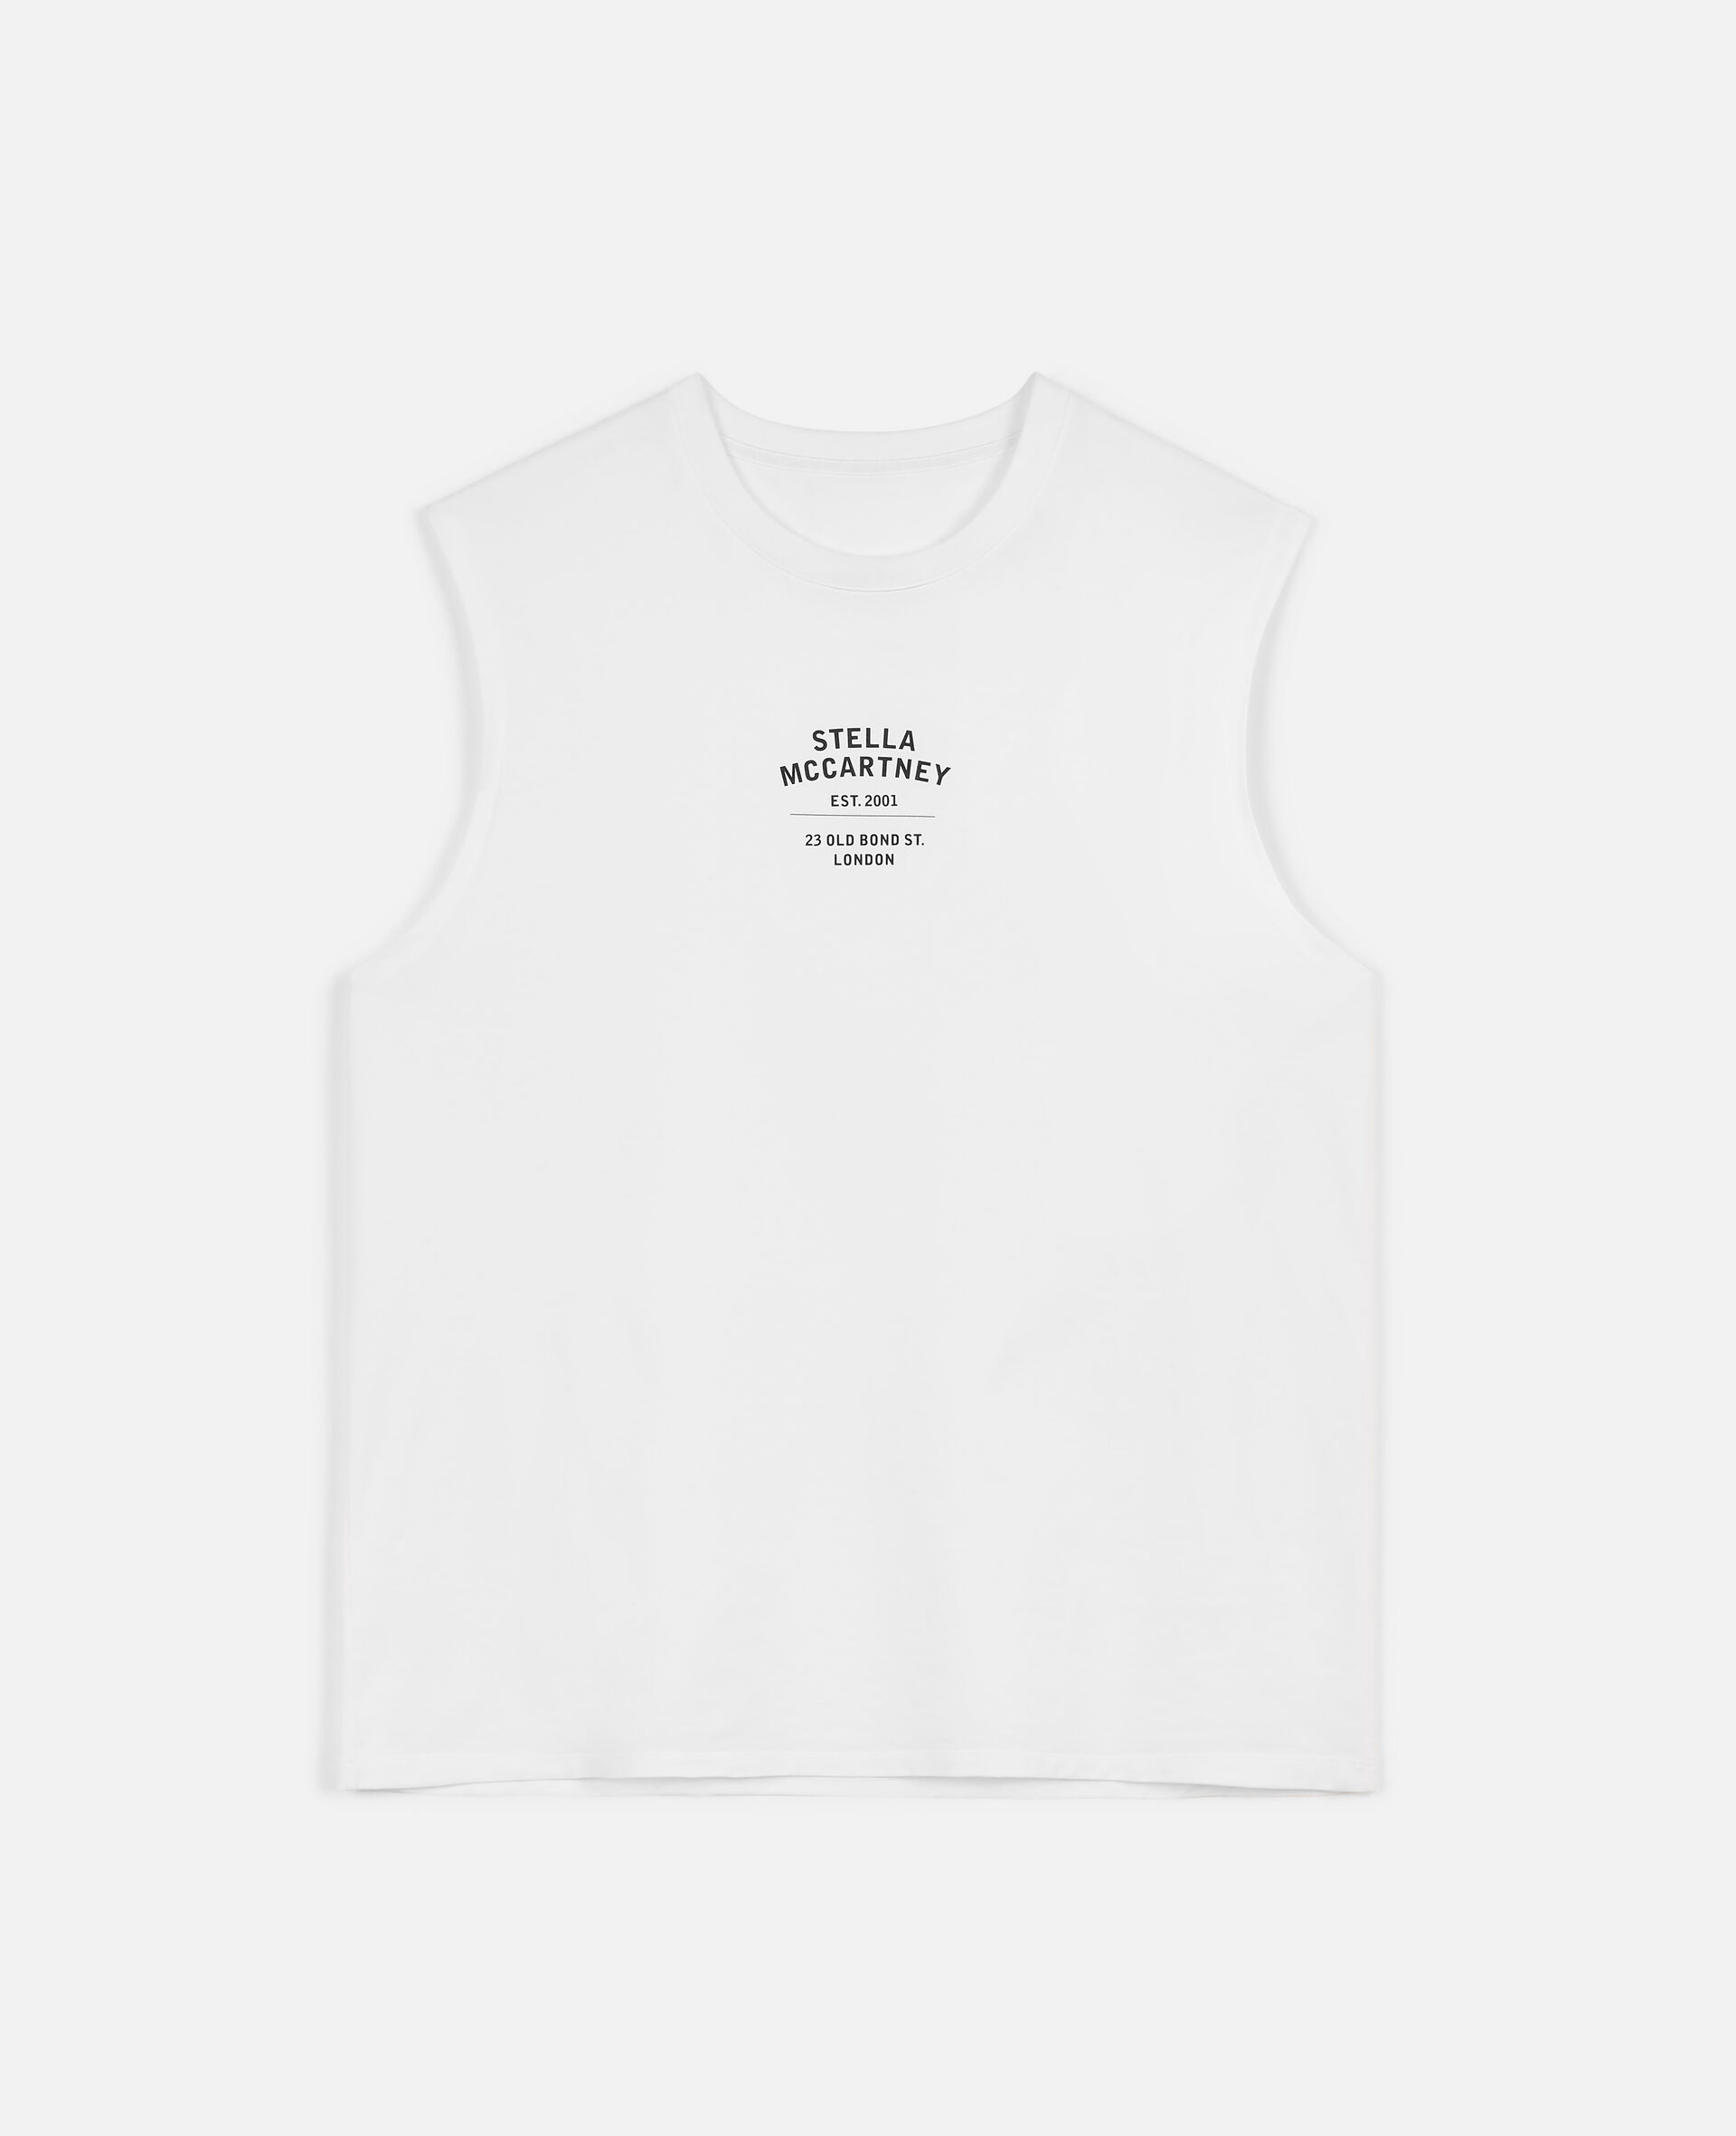 23 OBS ノースリーブ Tシャツ-ブラック-large image number 0